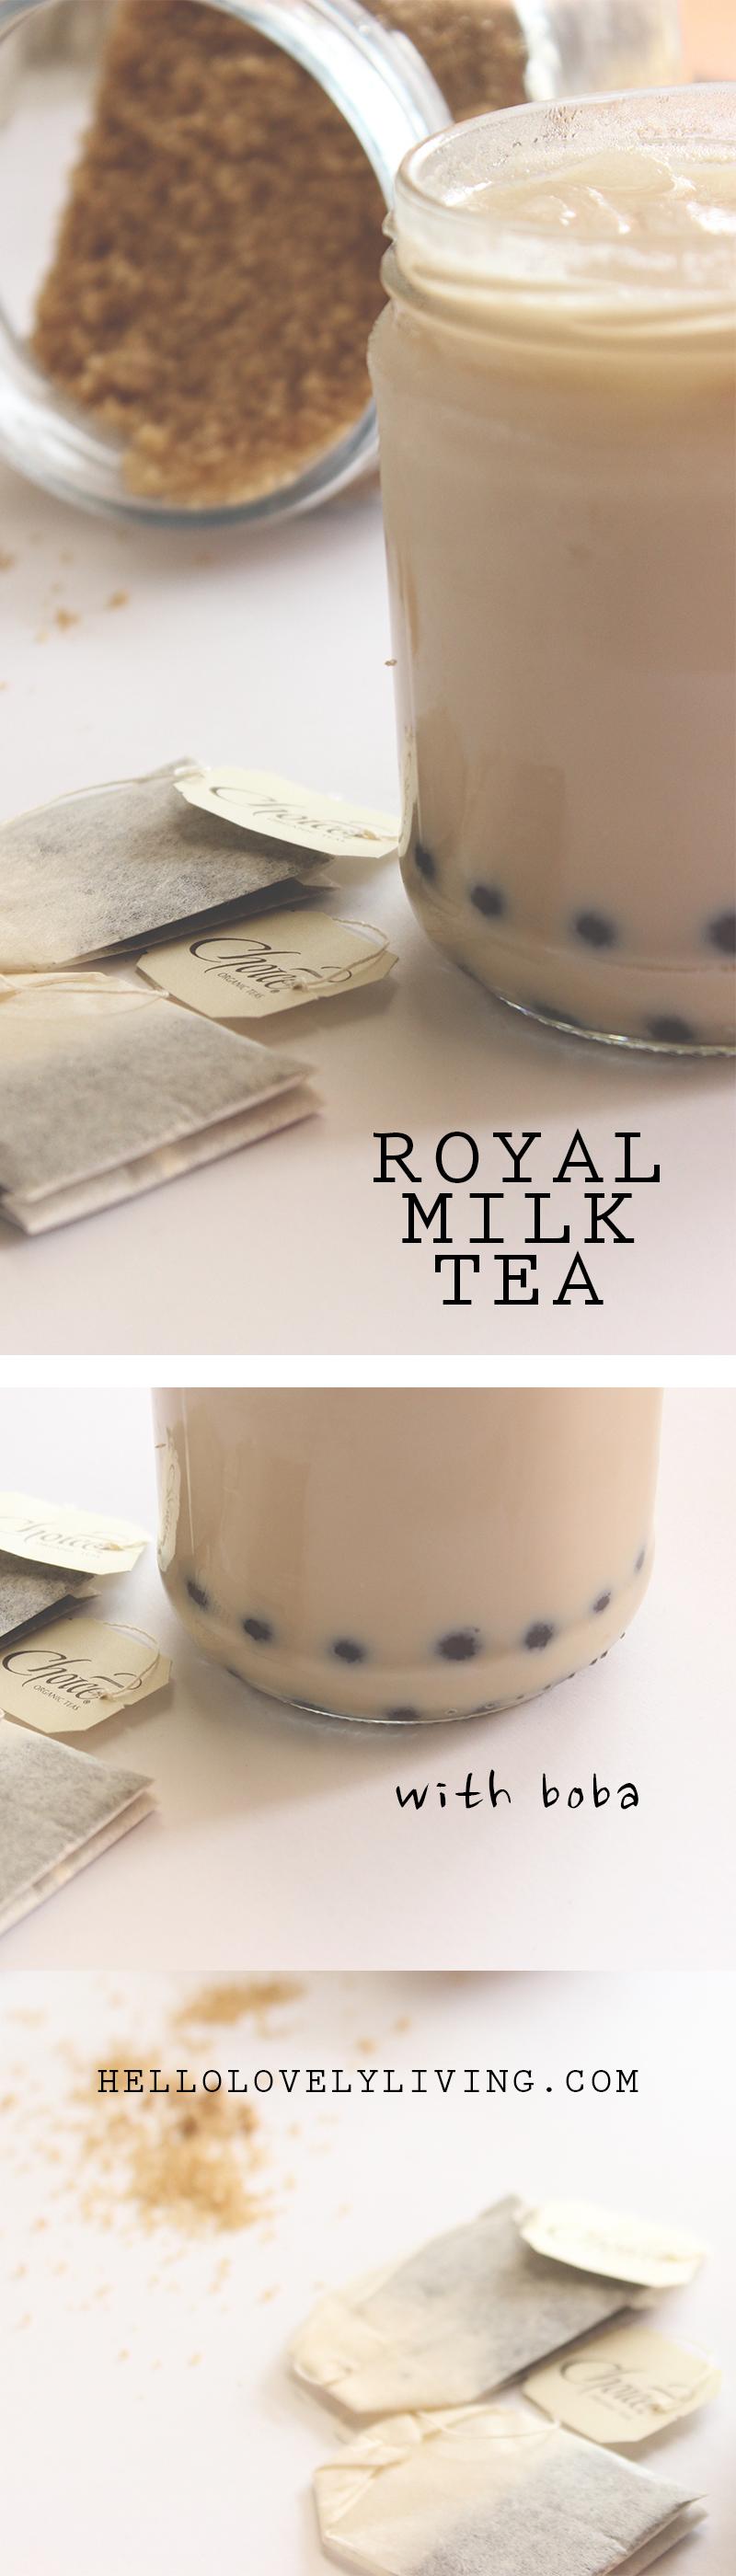 Royal Milk Tea with Boba